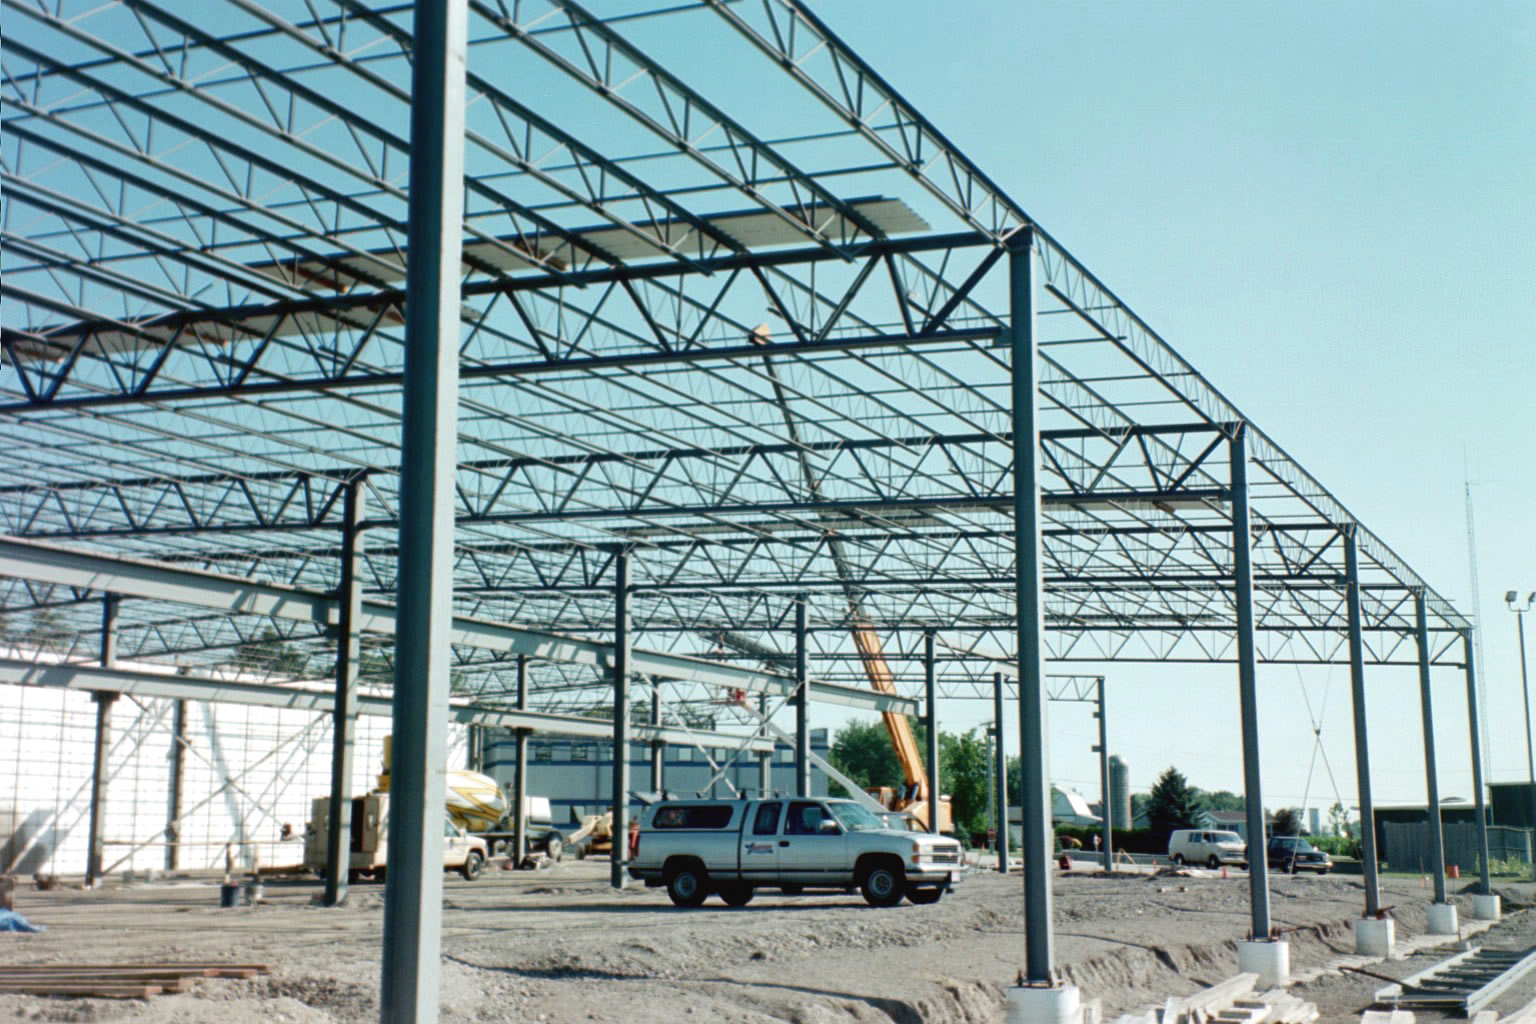 konstruksi baja ringan  Bengkel Las Lampung  Bengkel Las